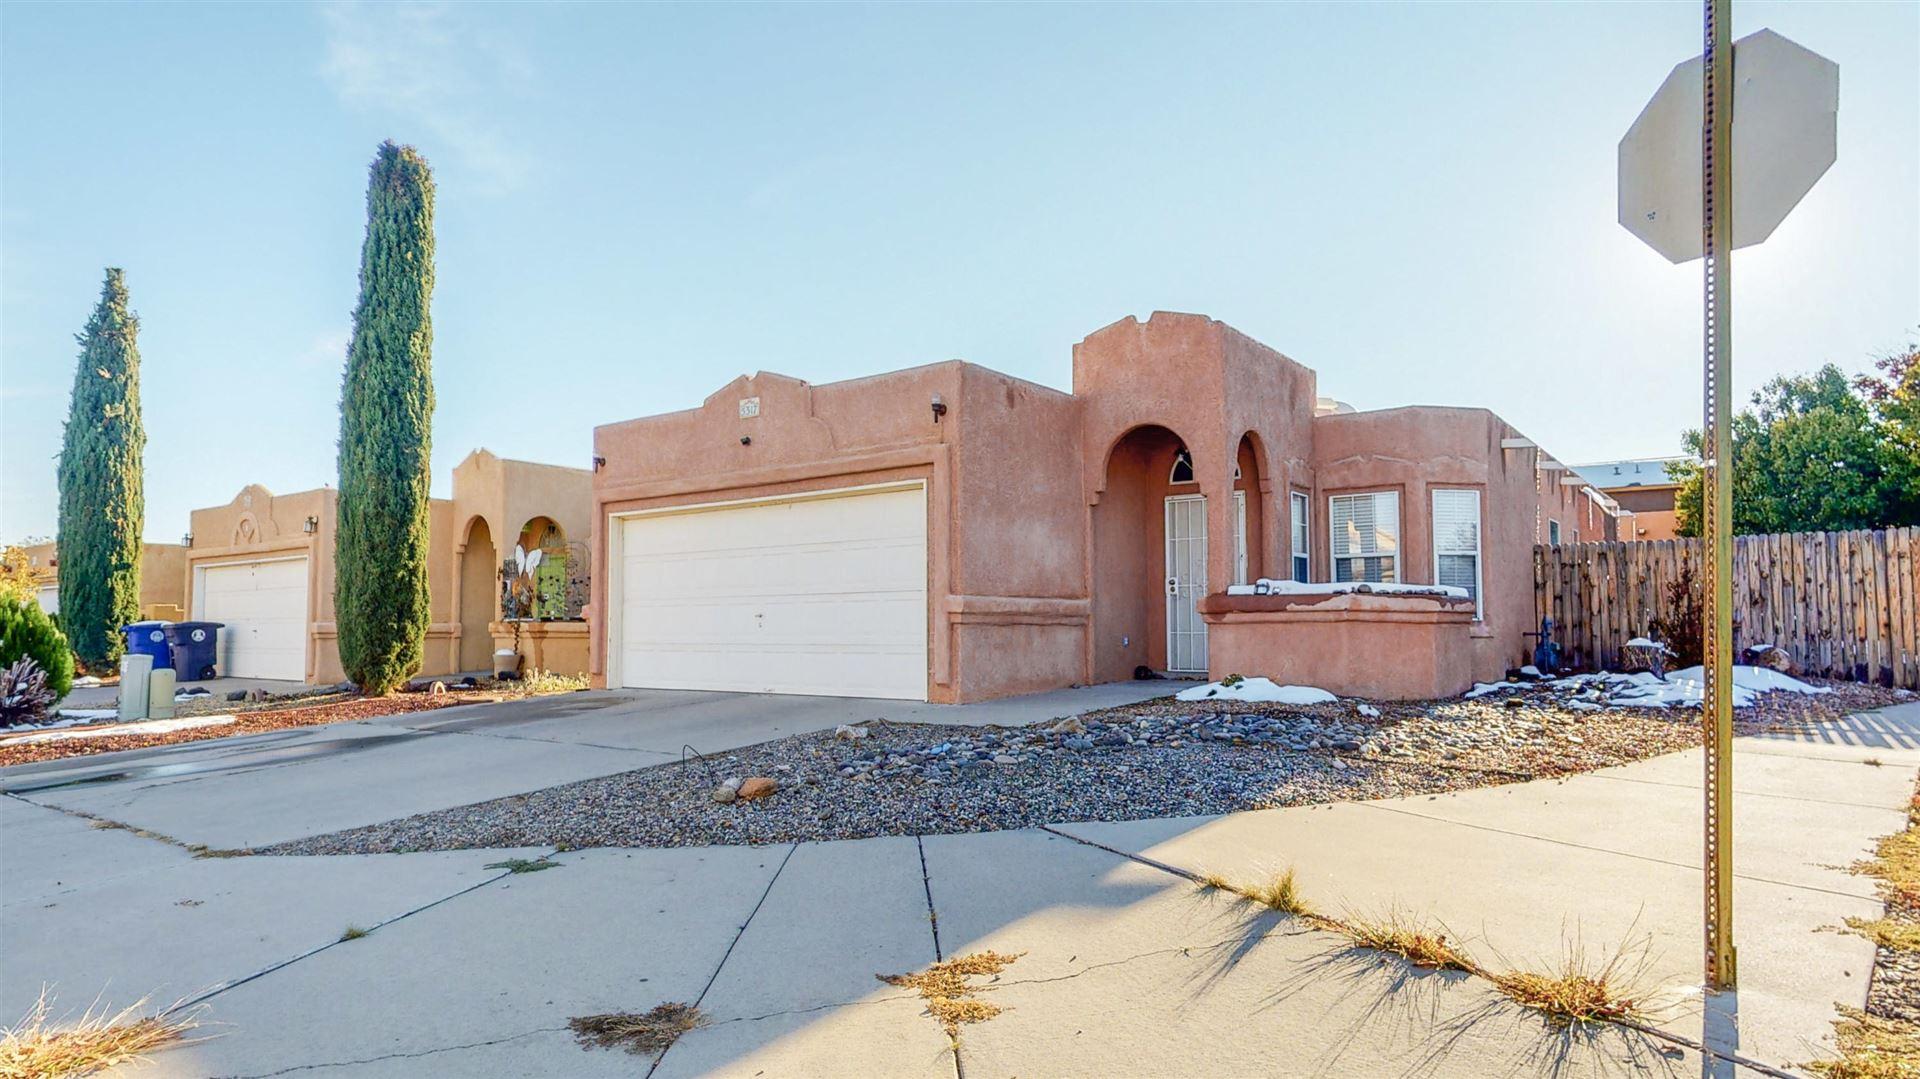 Photo of 5317 VALENTINO Street NW, Albuquerque, NM 87120 (MLS # 980138)